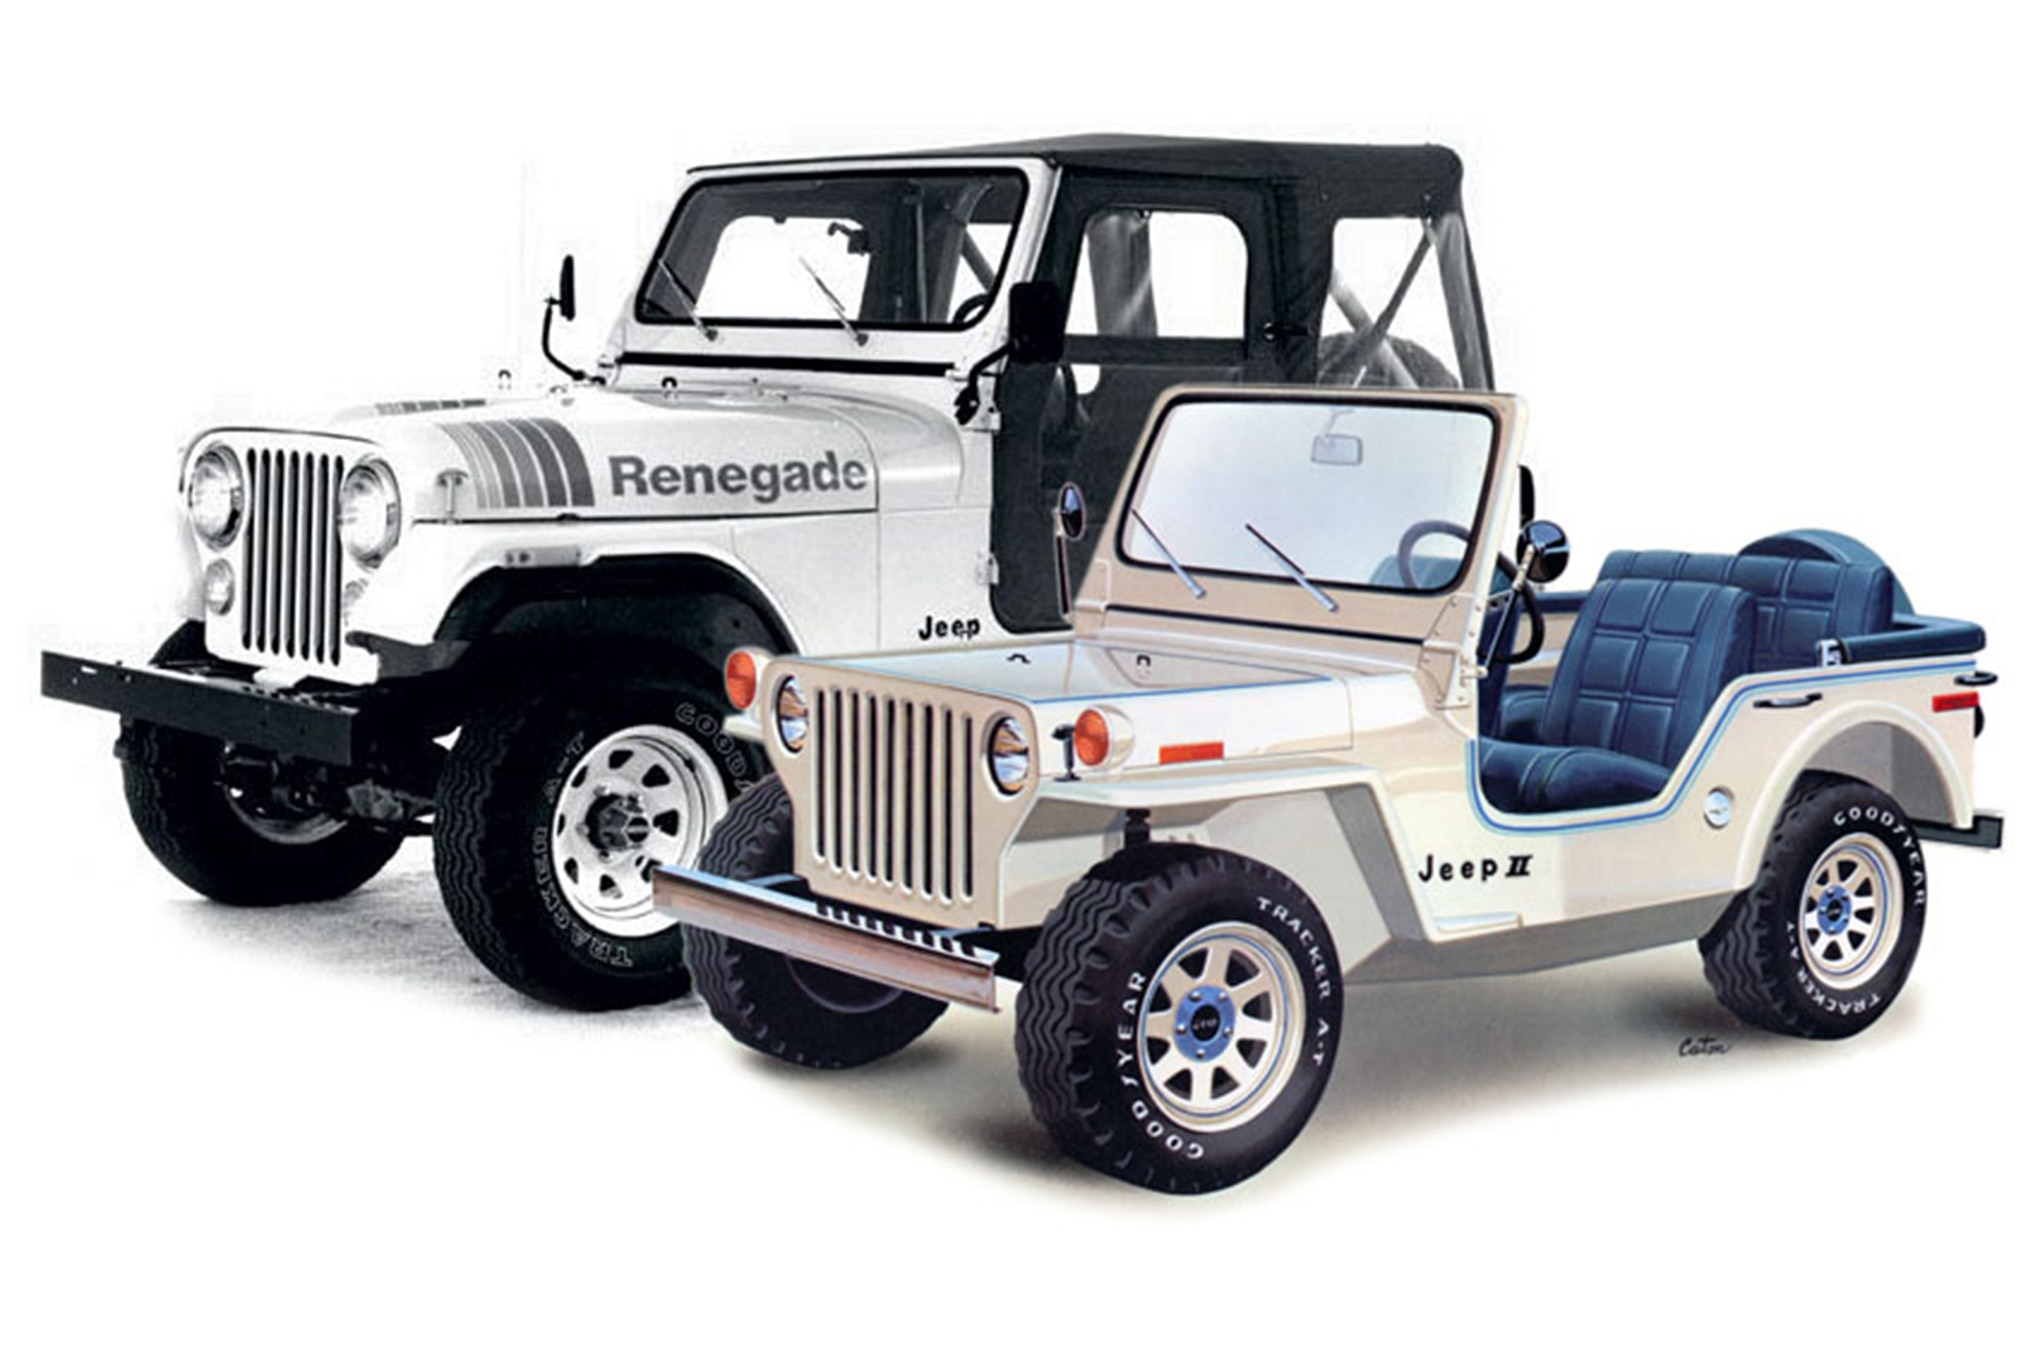 002 american motors corporation jeep II concept